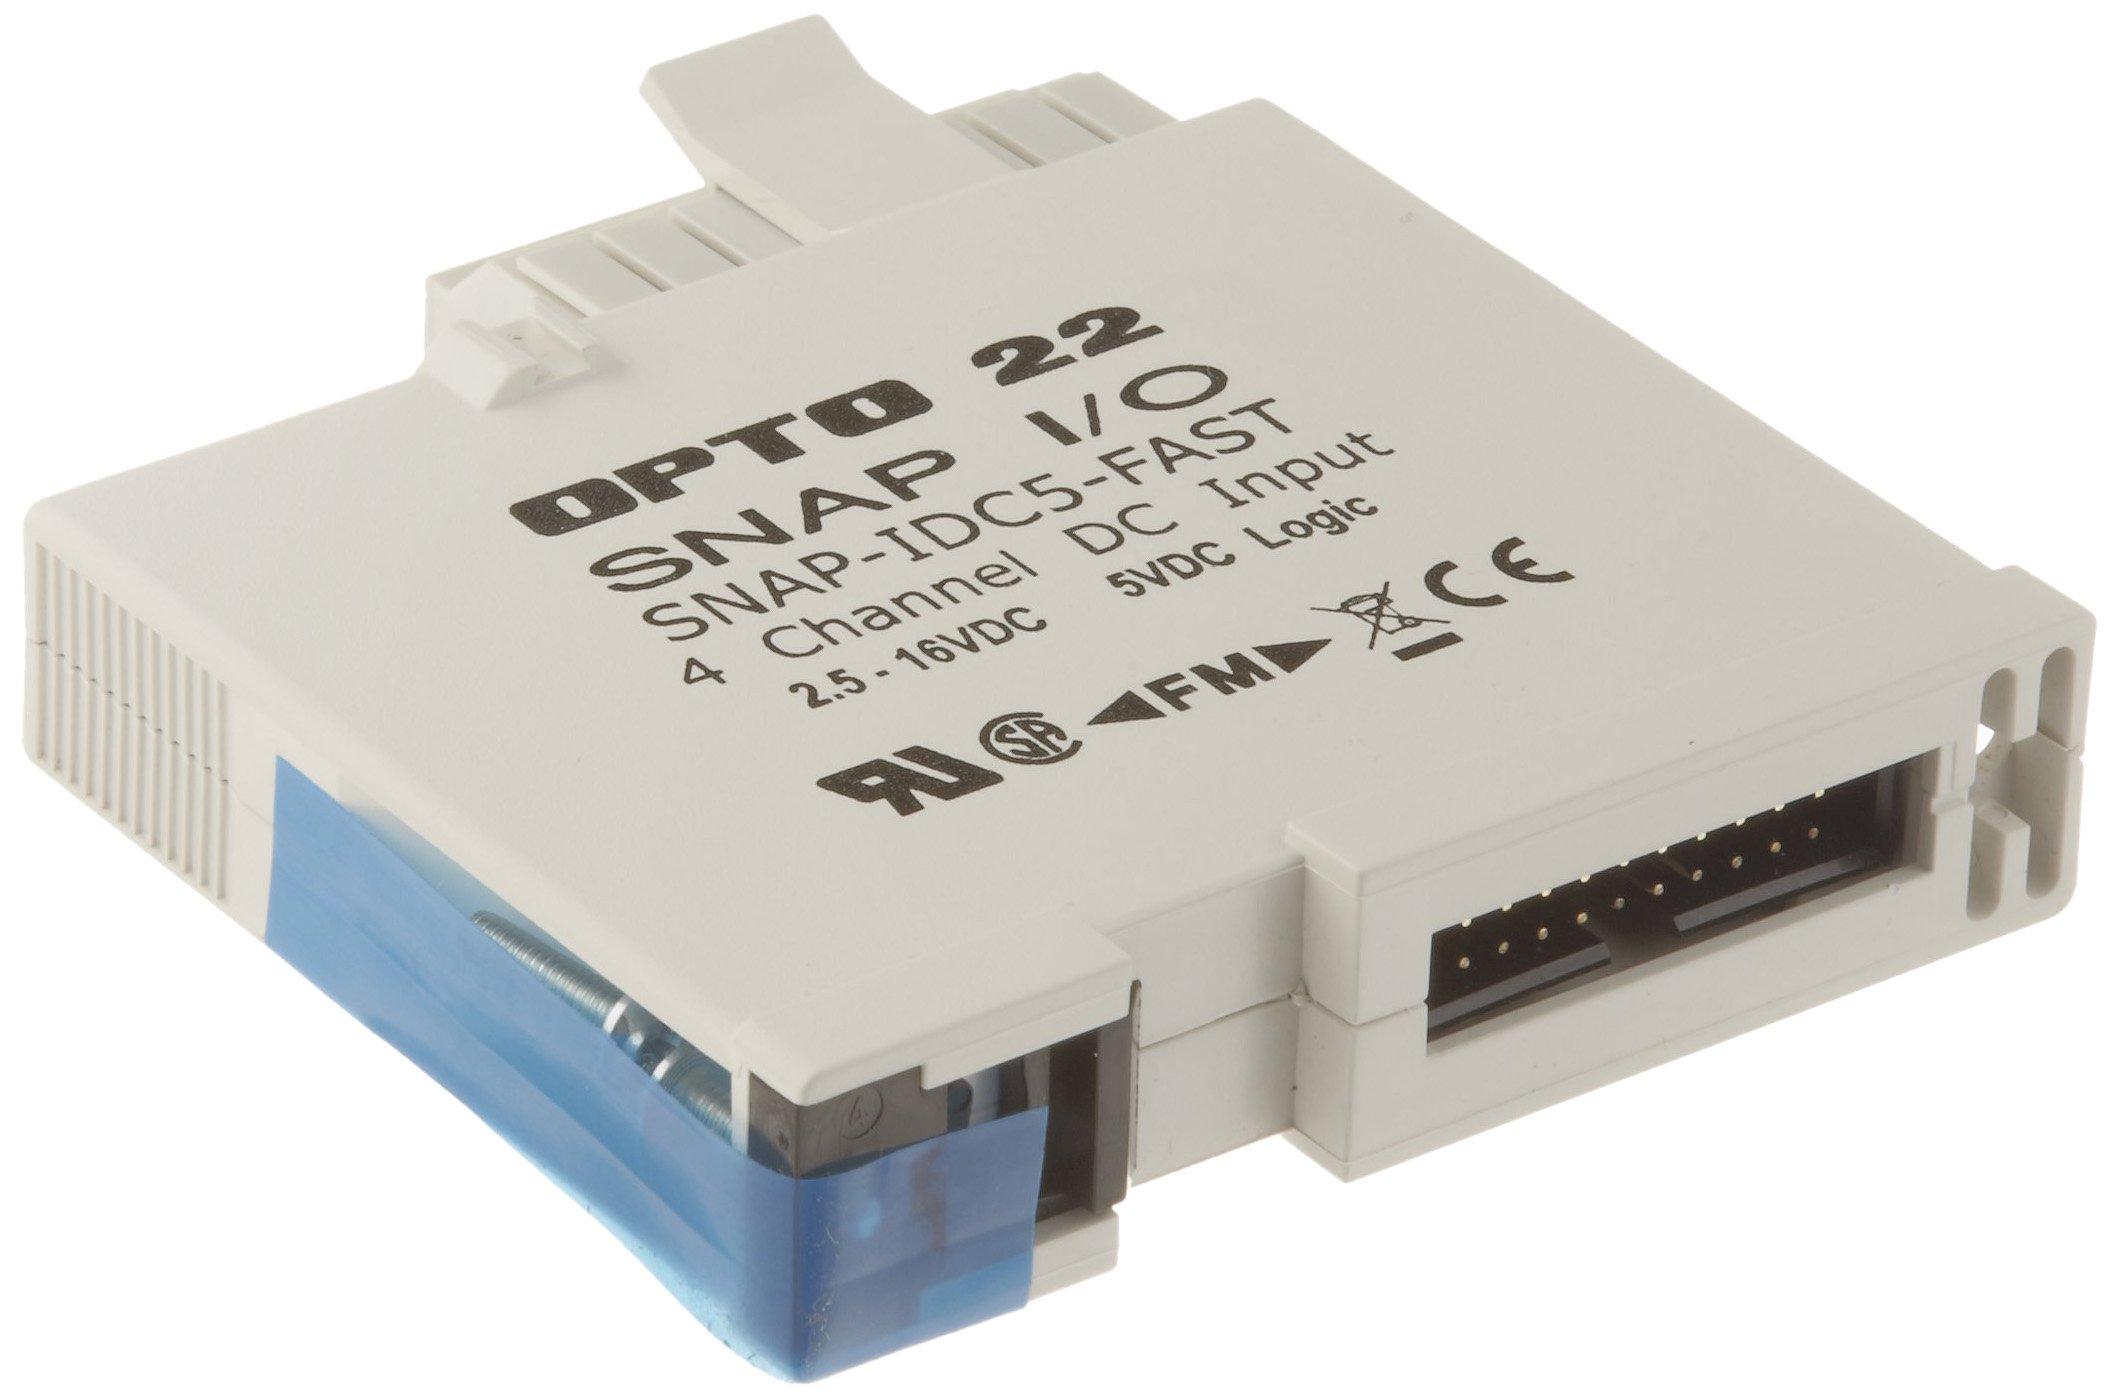 Opto 22 SNAP-IDC5FAST - SNAP High-Speed Digital (Discrete) Input Module, 4-Channel, 2.5 - 16 VDC